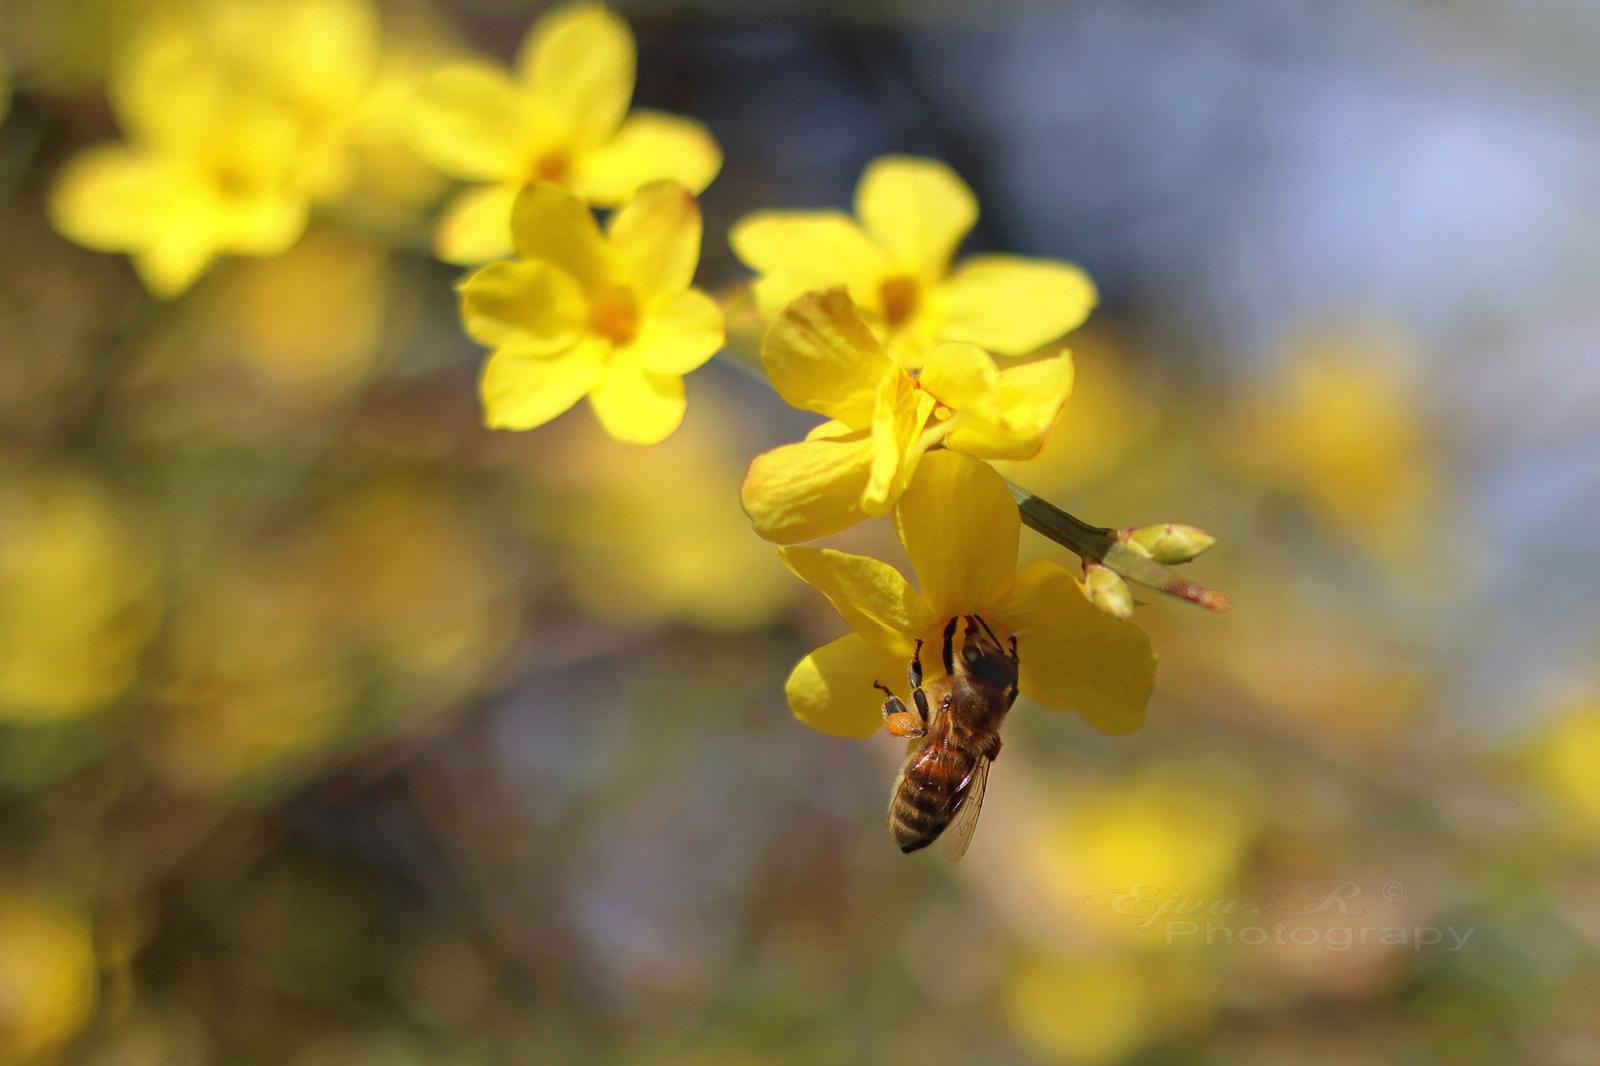 Háziméh Tavasz Virágok